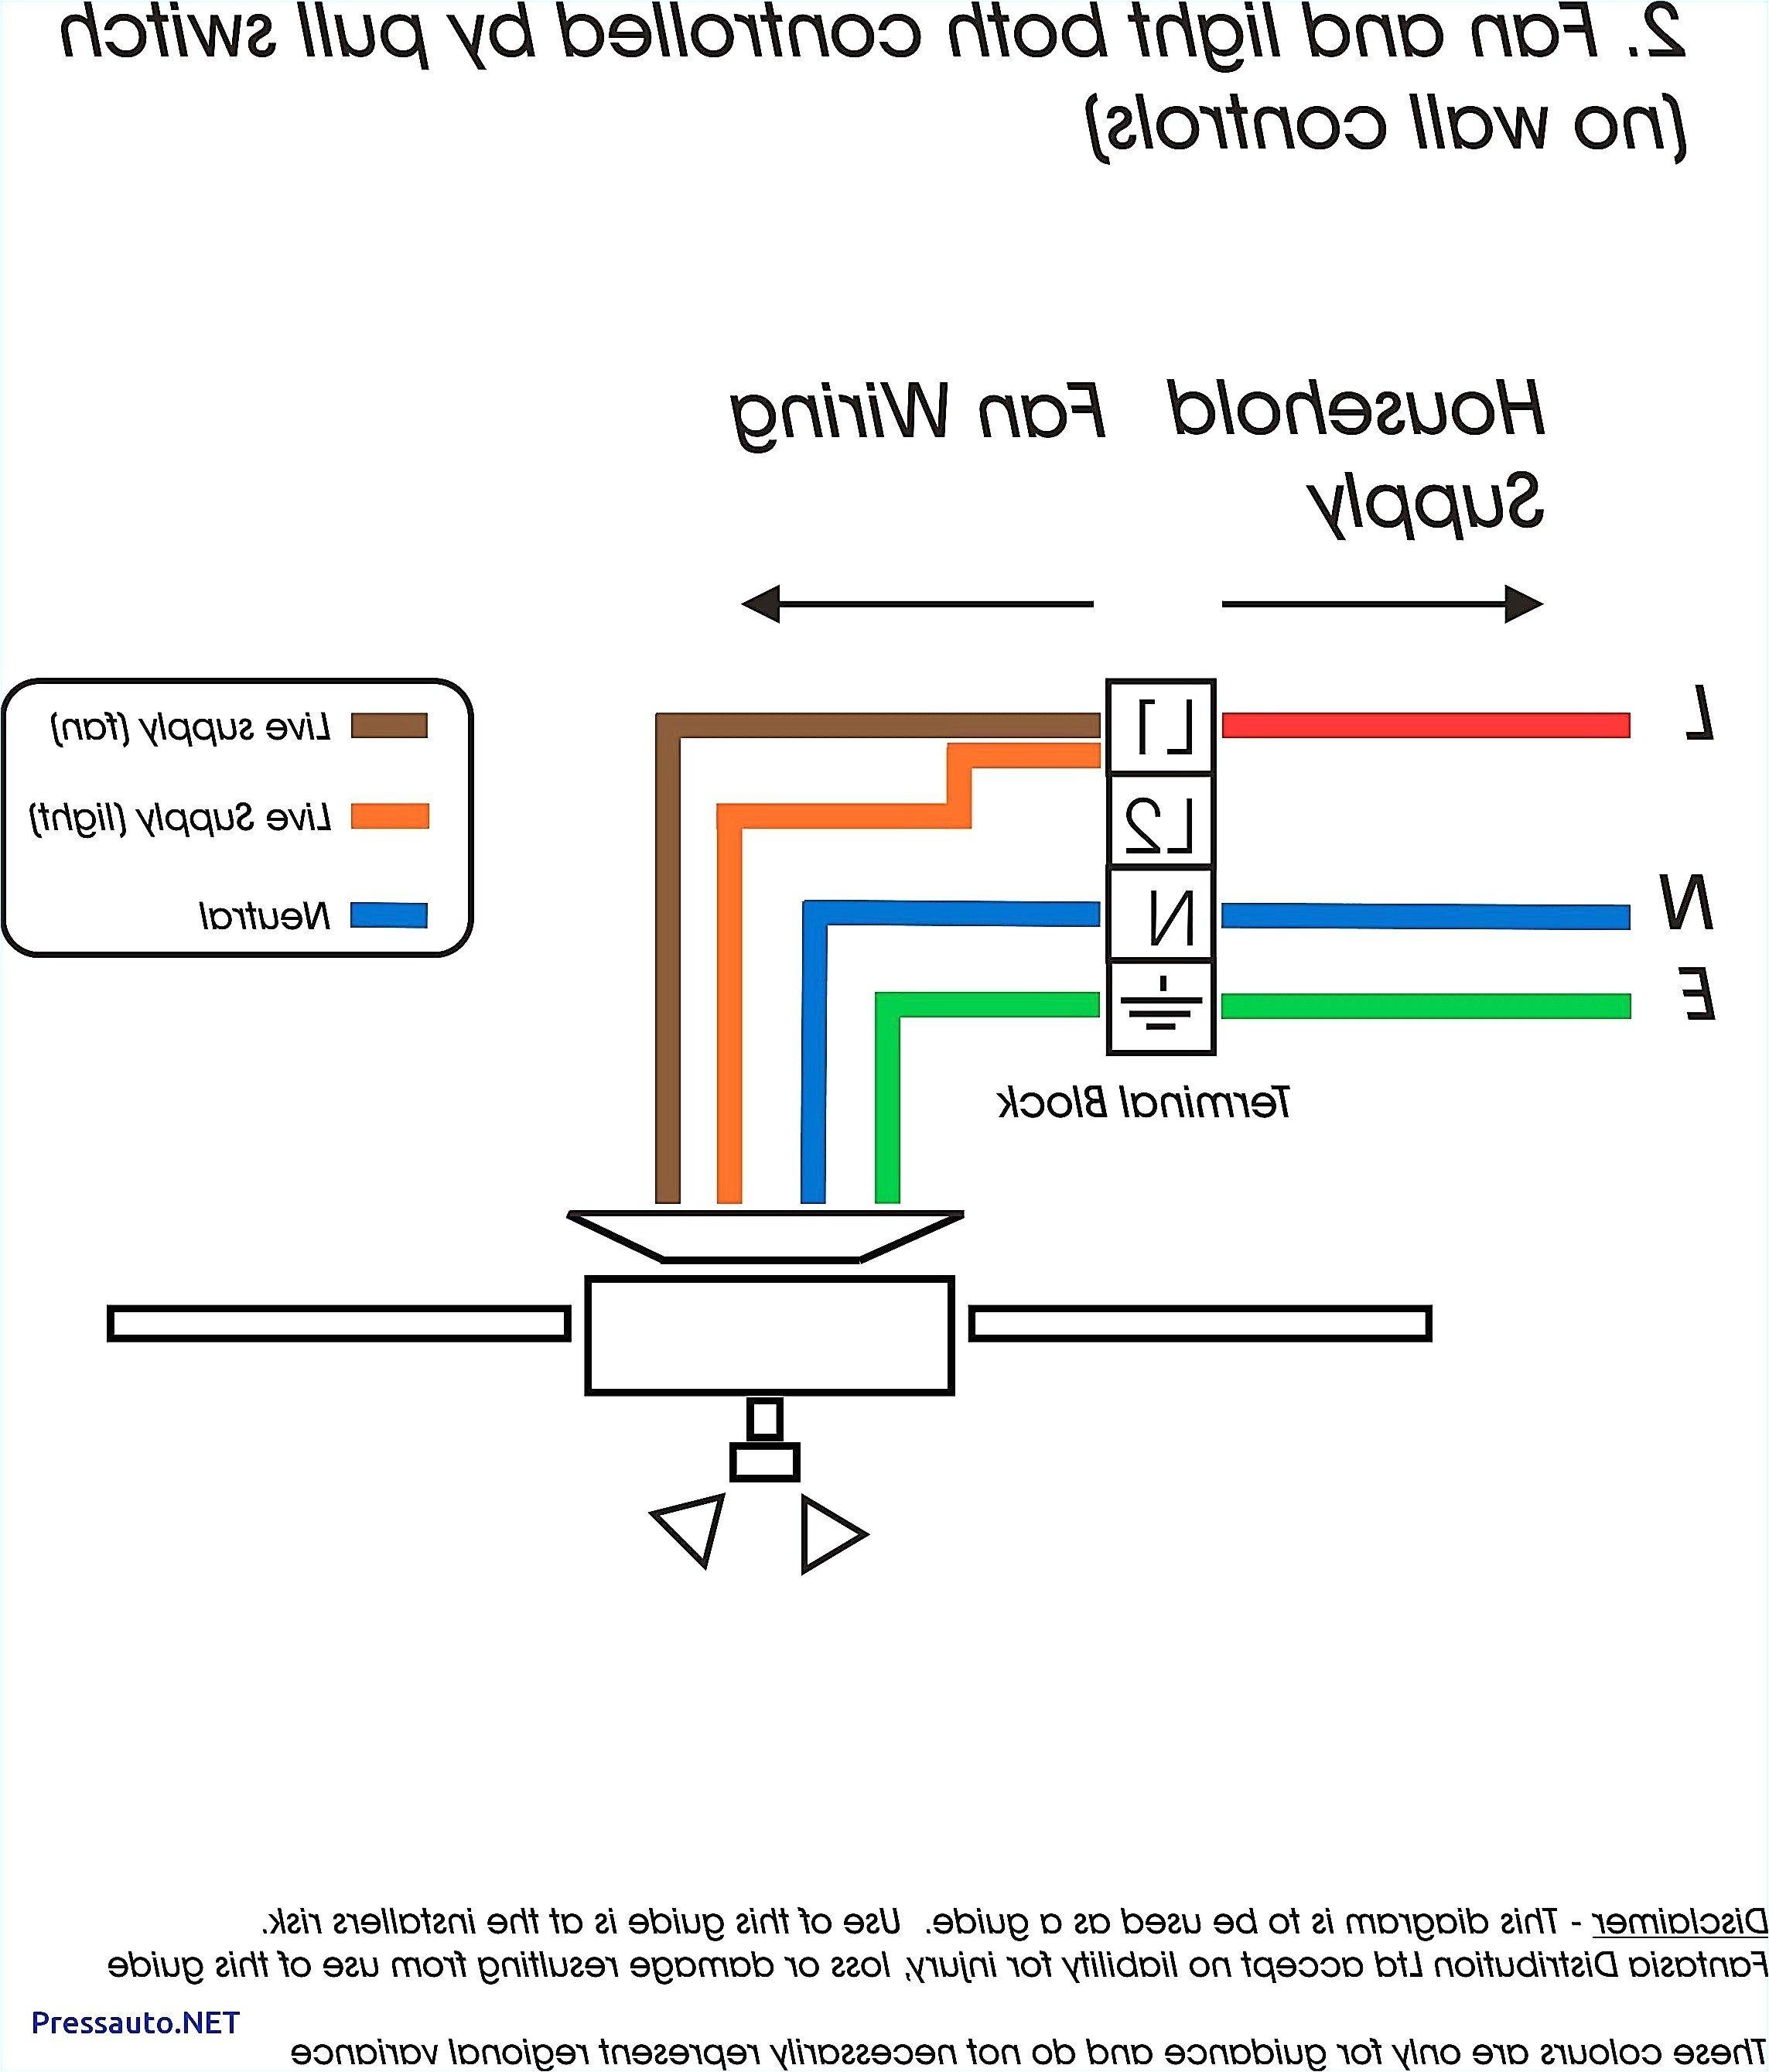 dodge ram 1500 fog light wiring diagram dodge dakota fog light wiring diagram dodge ram